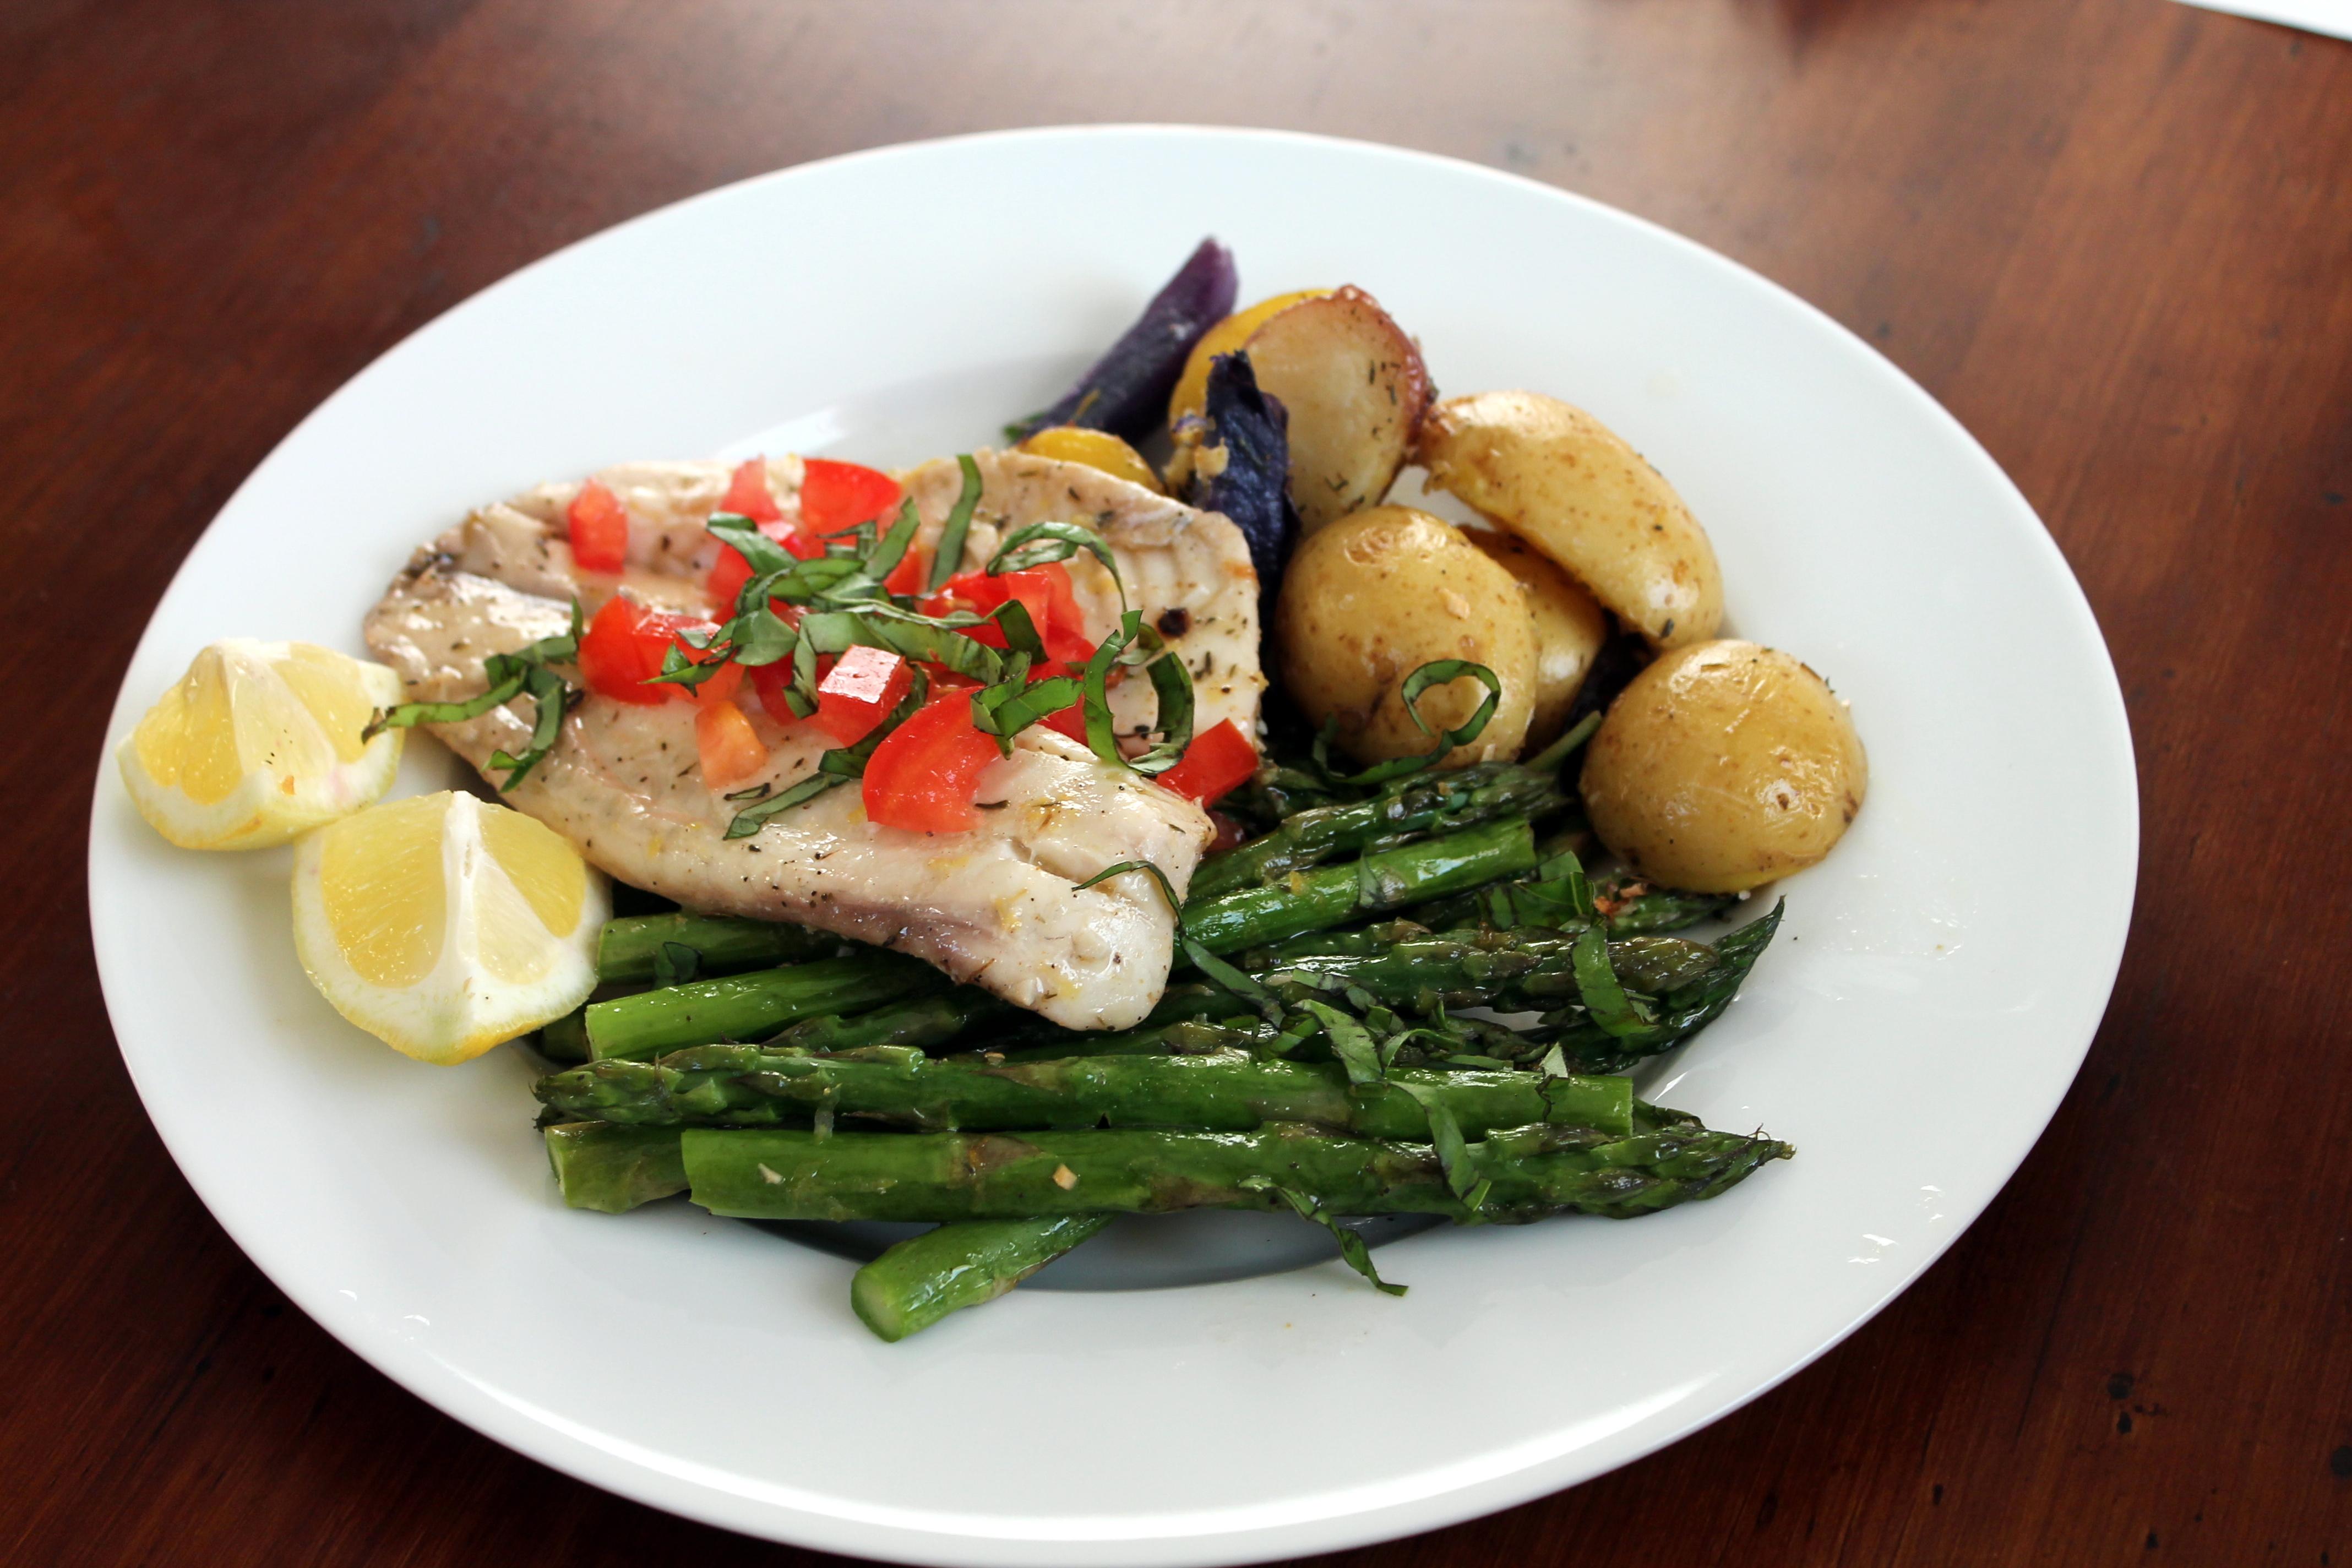 Tags: Asparagus, Baked, Easy, Fish, Lemon, Potato, Potatoes, Roasting,  Tilapia